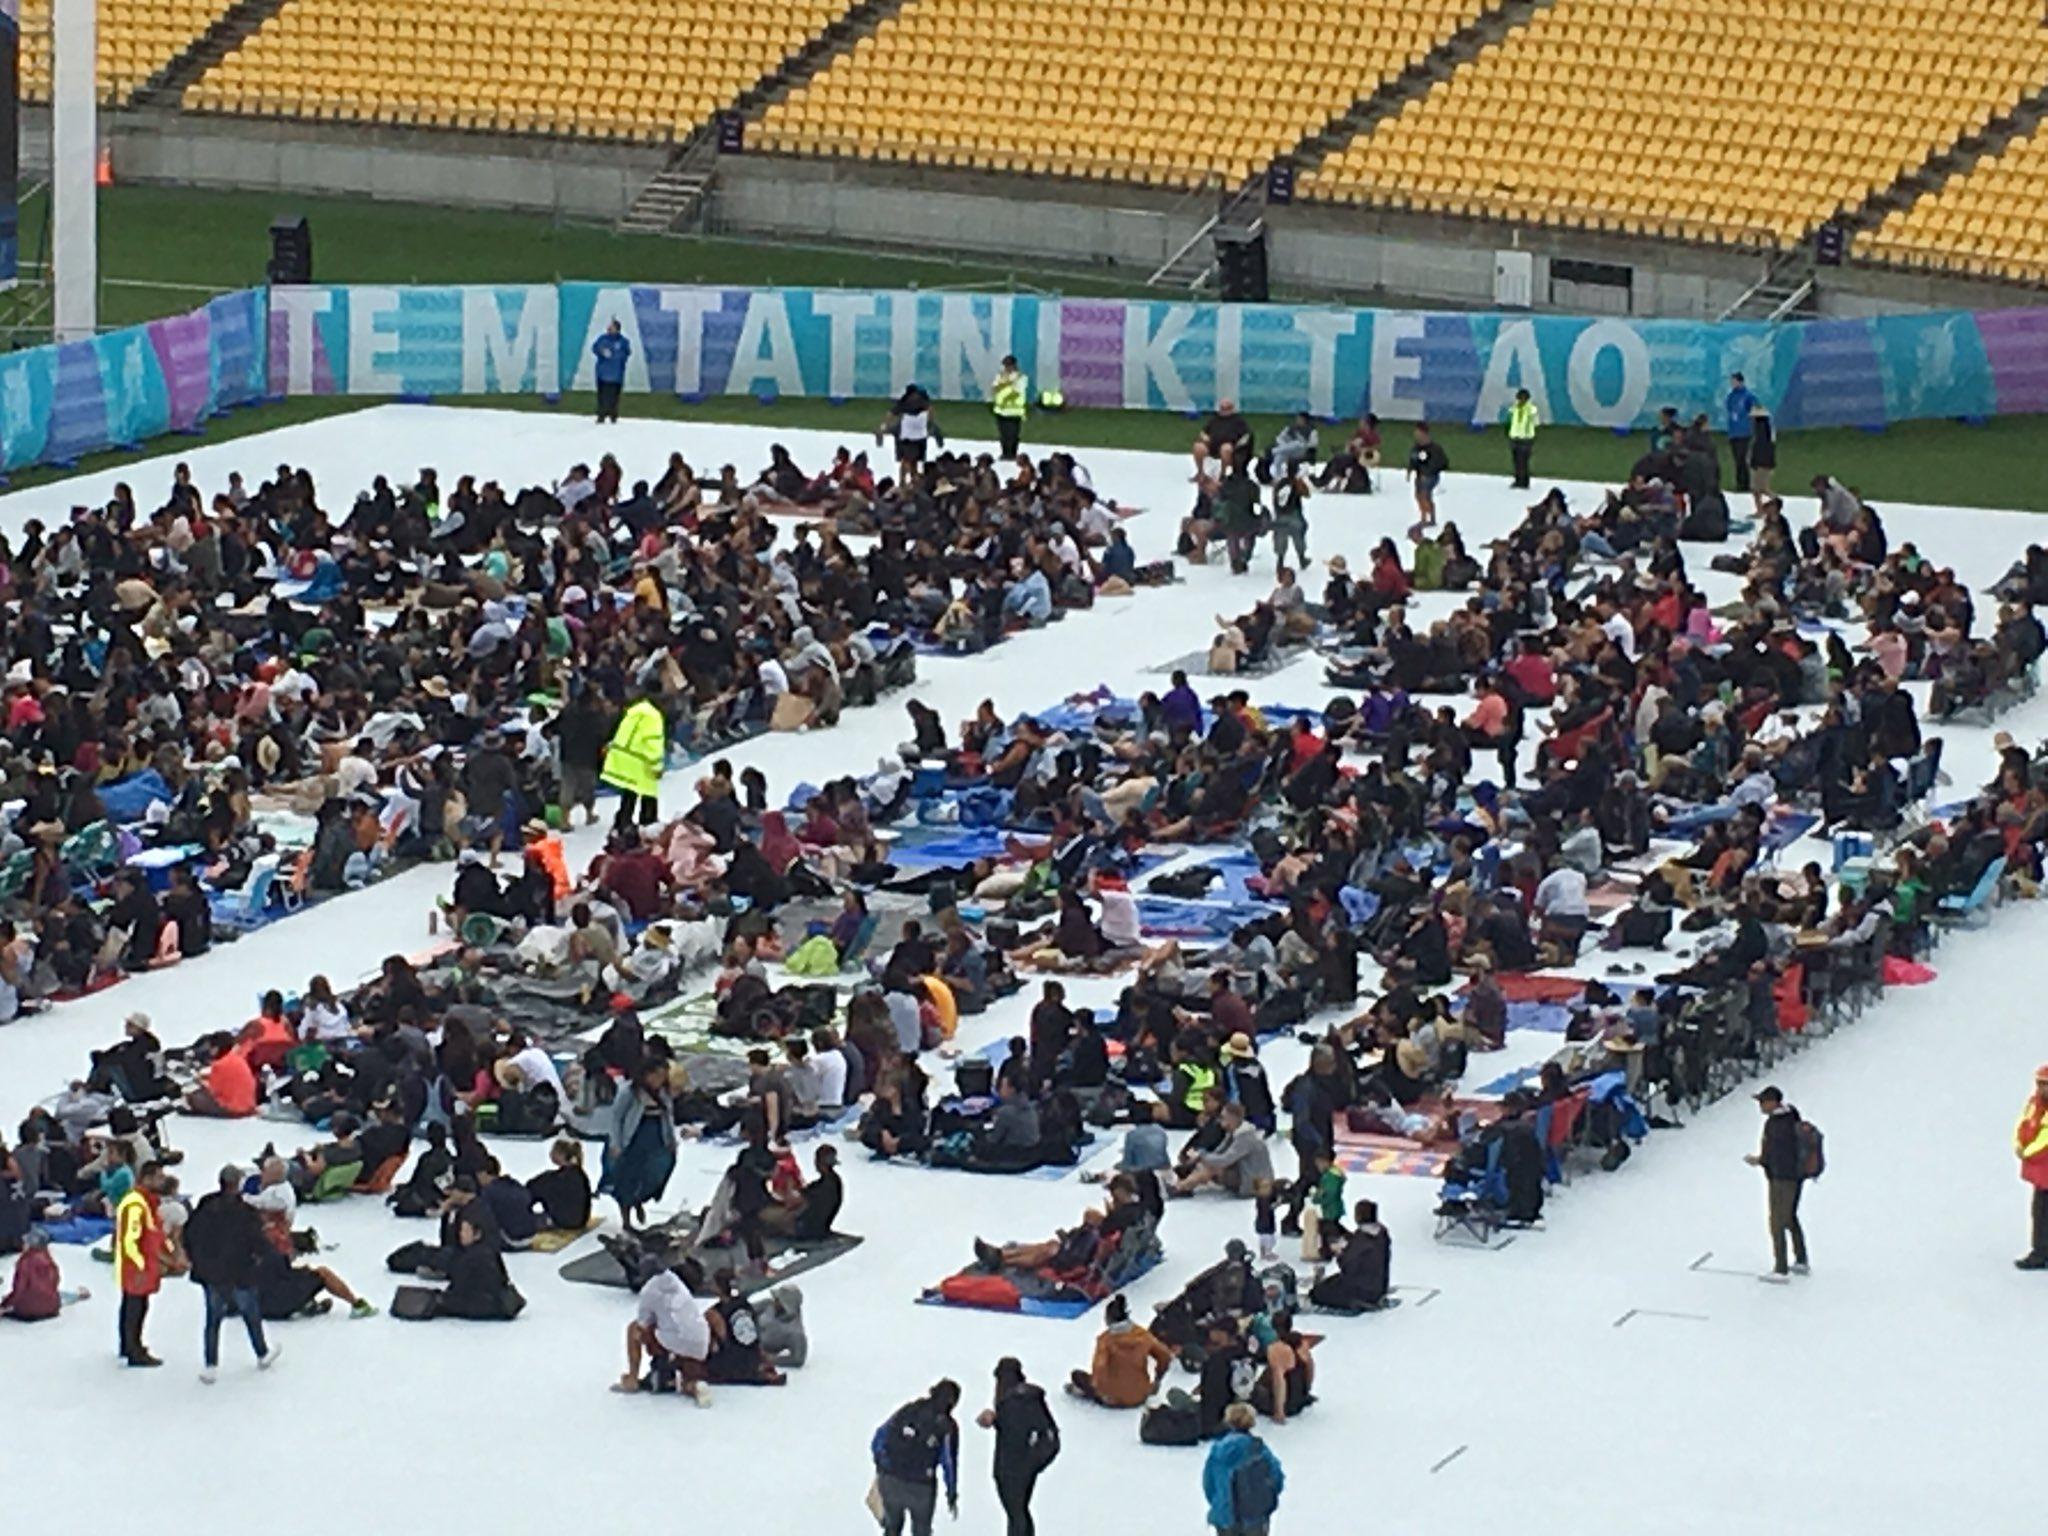 It's Day 3 of Te Matatini ki te Ao Kapa Haka Festival! Another full schedule of amazing performances, and the weather is looking good! @TeMatatini #tematatini #TeMatatini2019 #tematatinikiteao https://t.co/8xjyFutATv